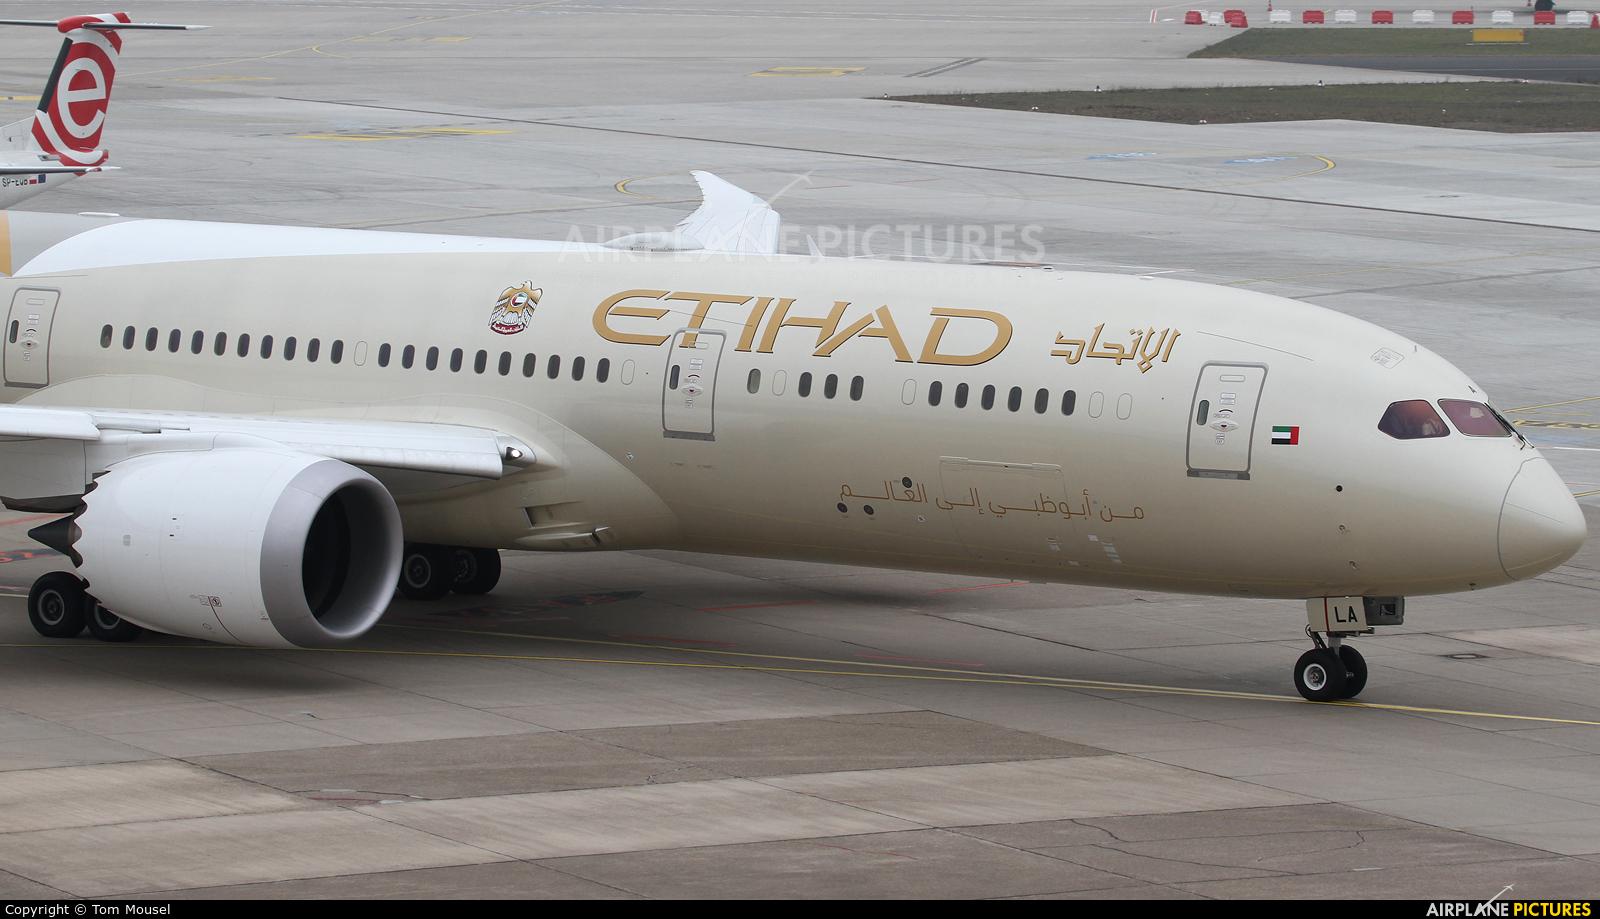 Etihad Airways A6-BLA aircraft at Düsseldorf